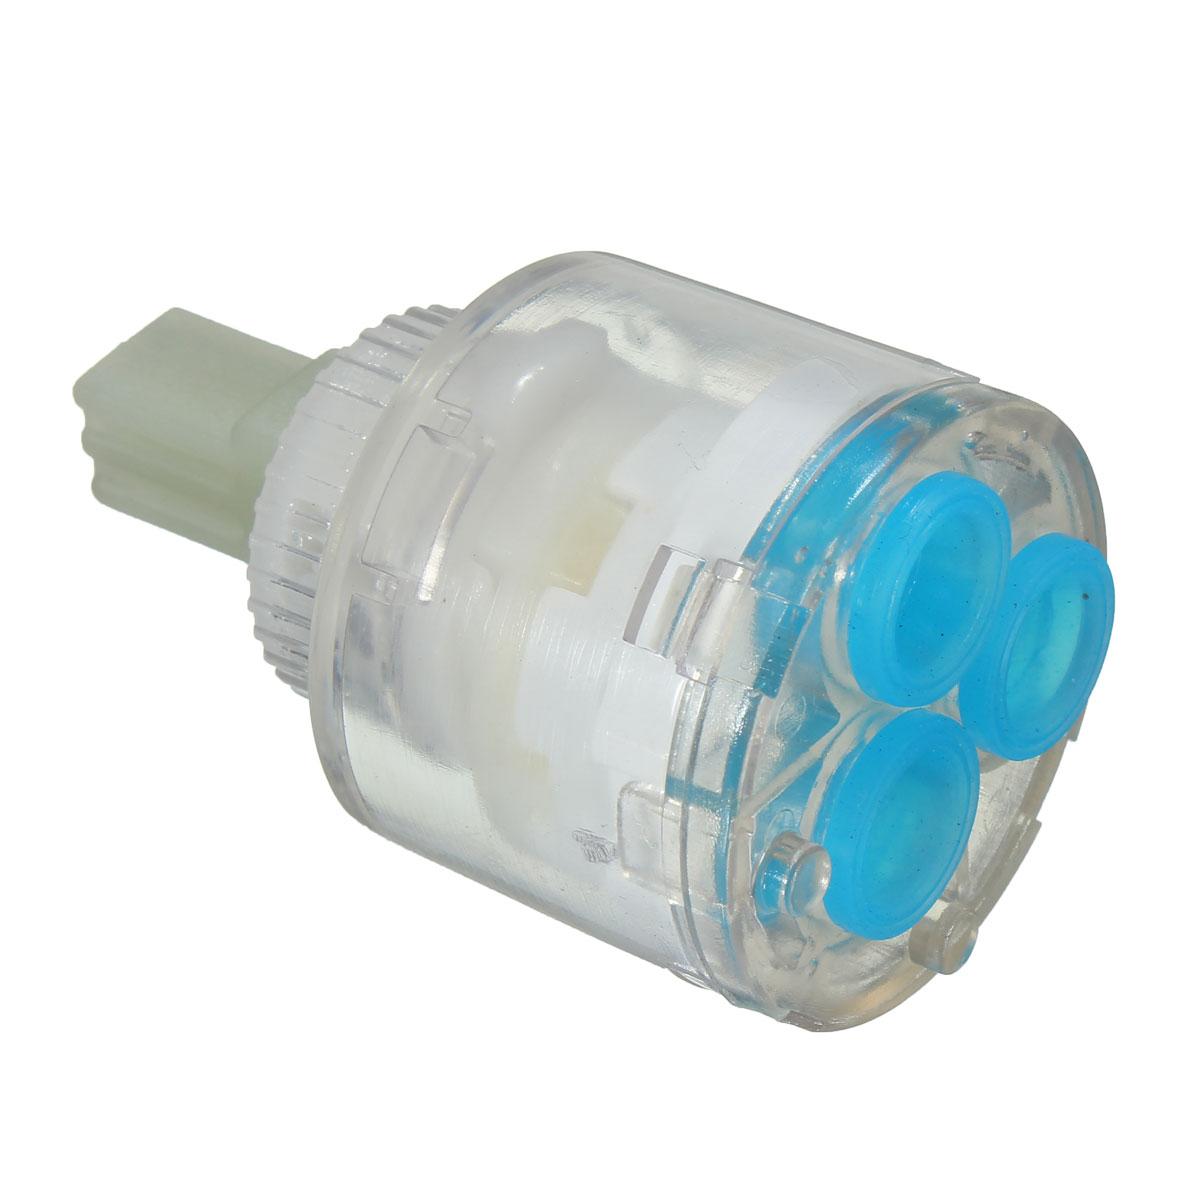 35mm Kitchen Bathroom Water Mixer Tap Faucet Ceramic Cartridge Valve Clear Blue Ebay